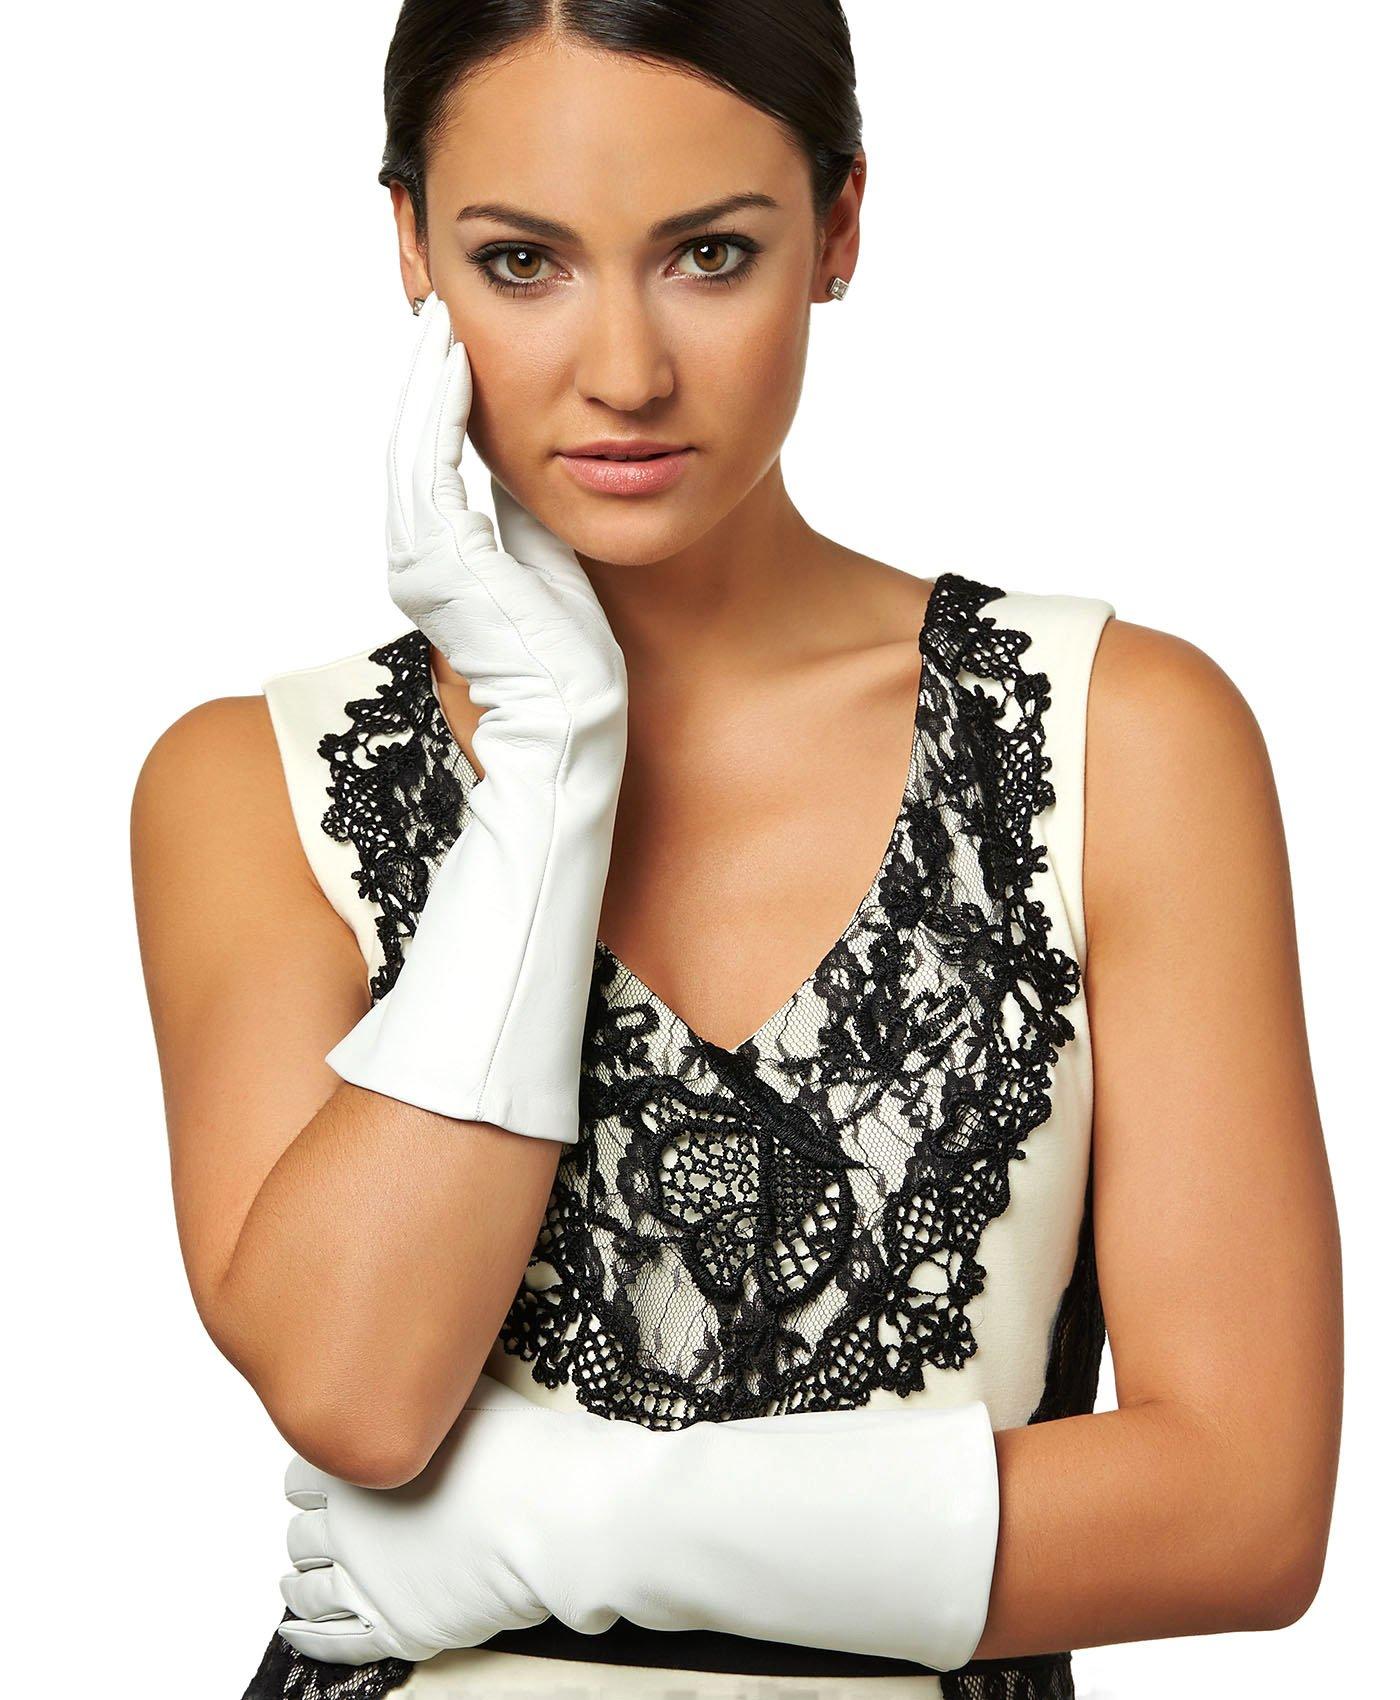 Fratelli Orsini Women's Italian Silk Lined 6-Button Length Bridal Gloves Size 7 1/2 Color White by Fratelli Orsini (Image #4)